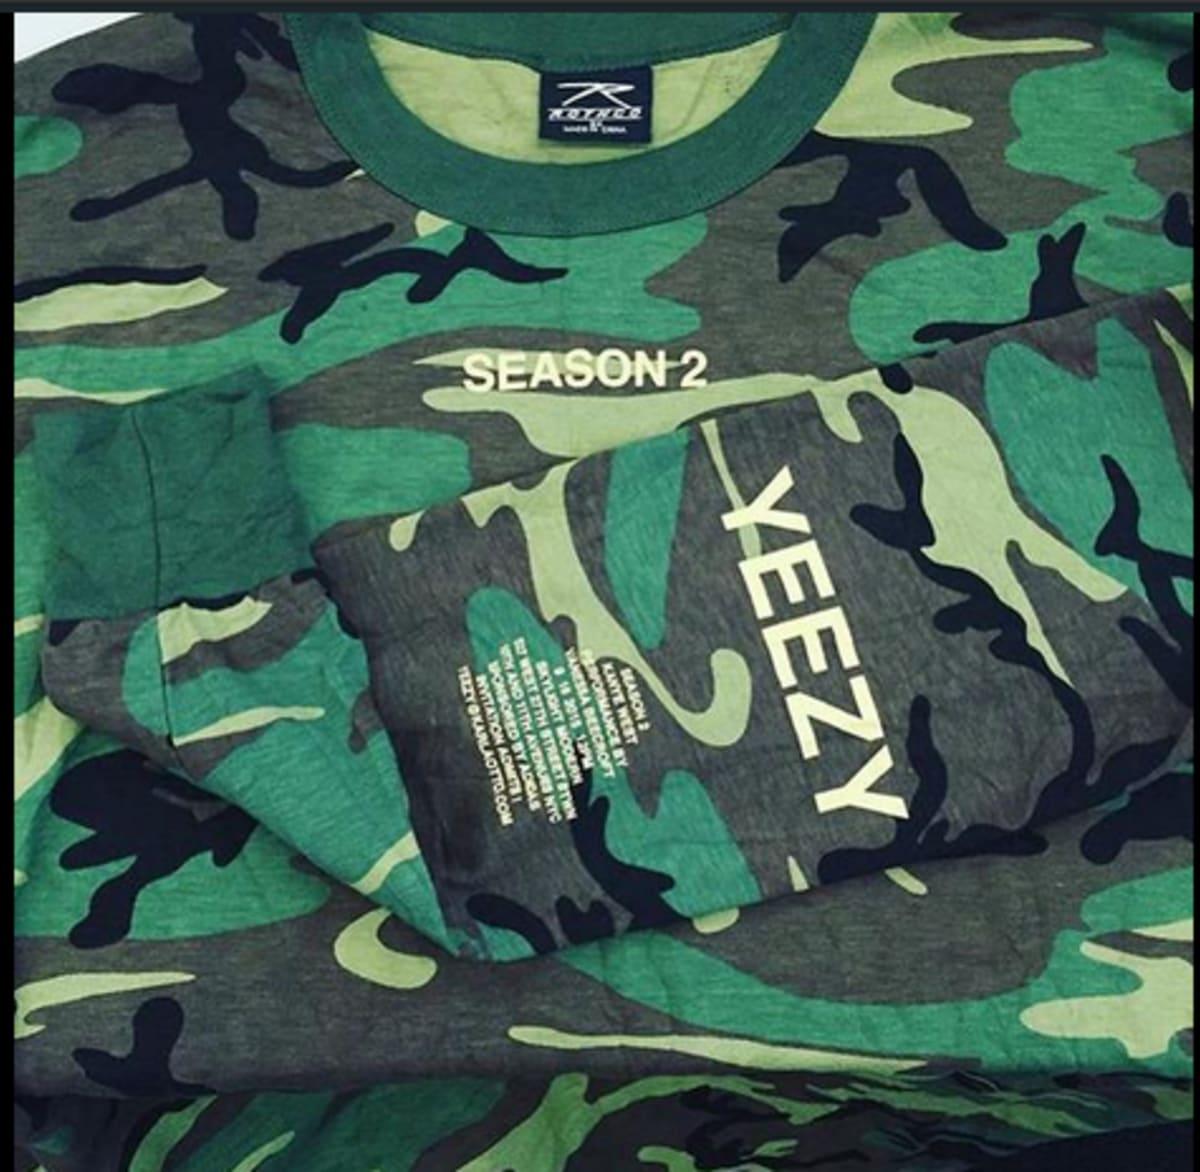 b02e64e75 Kanye West s Yeezy Season 2 Invites Are Printed On  13 Camo Long Sleeve  T-Shirts